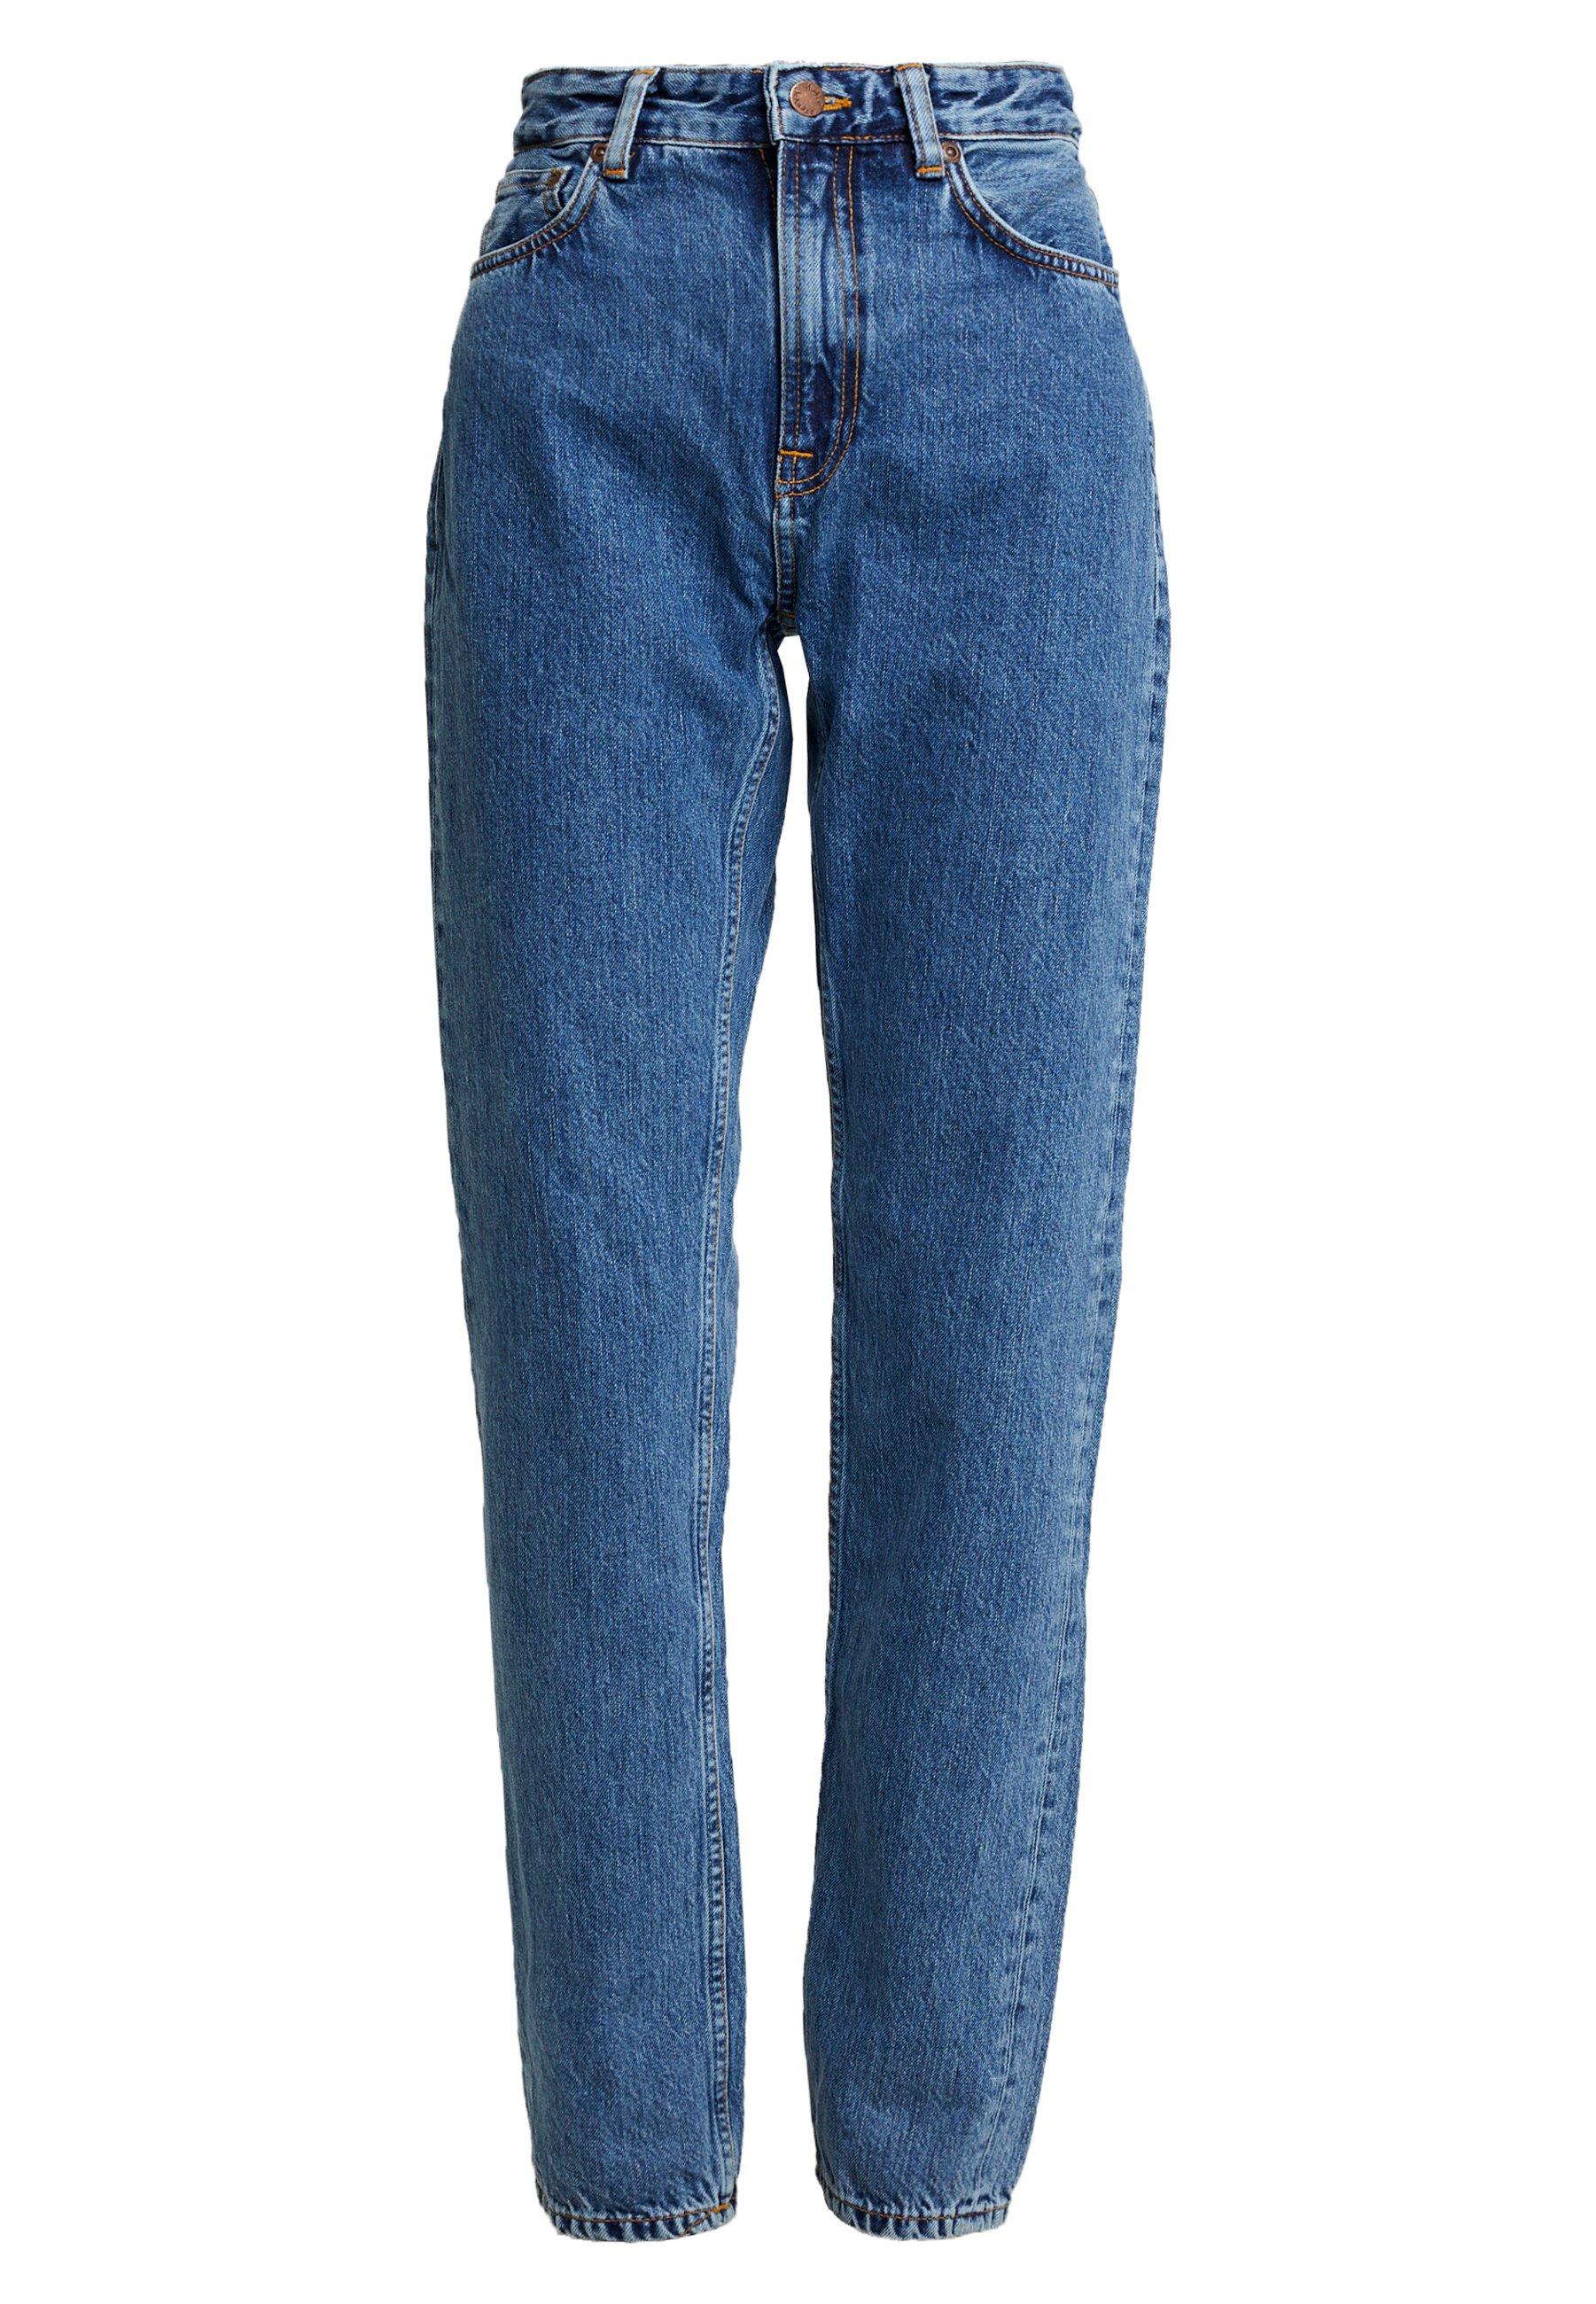 Nudie Jeans Breezy Britt - Straight Leg Tie Dye